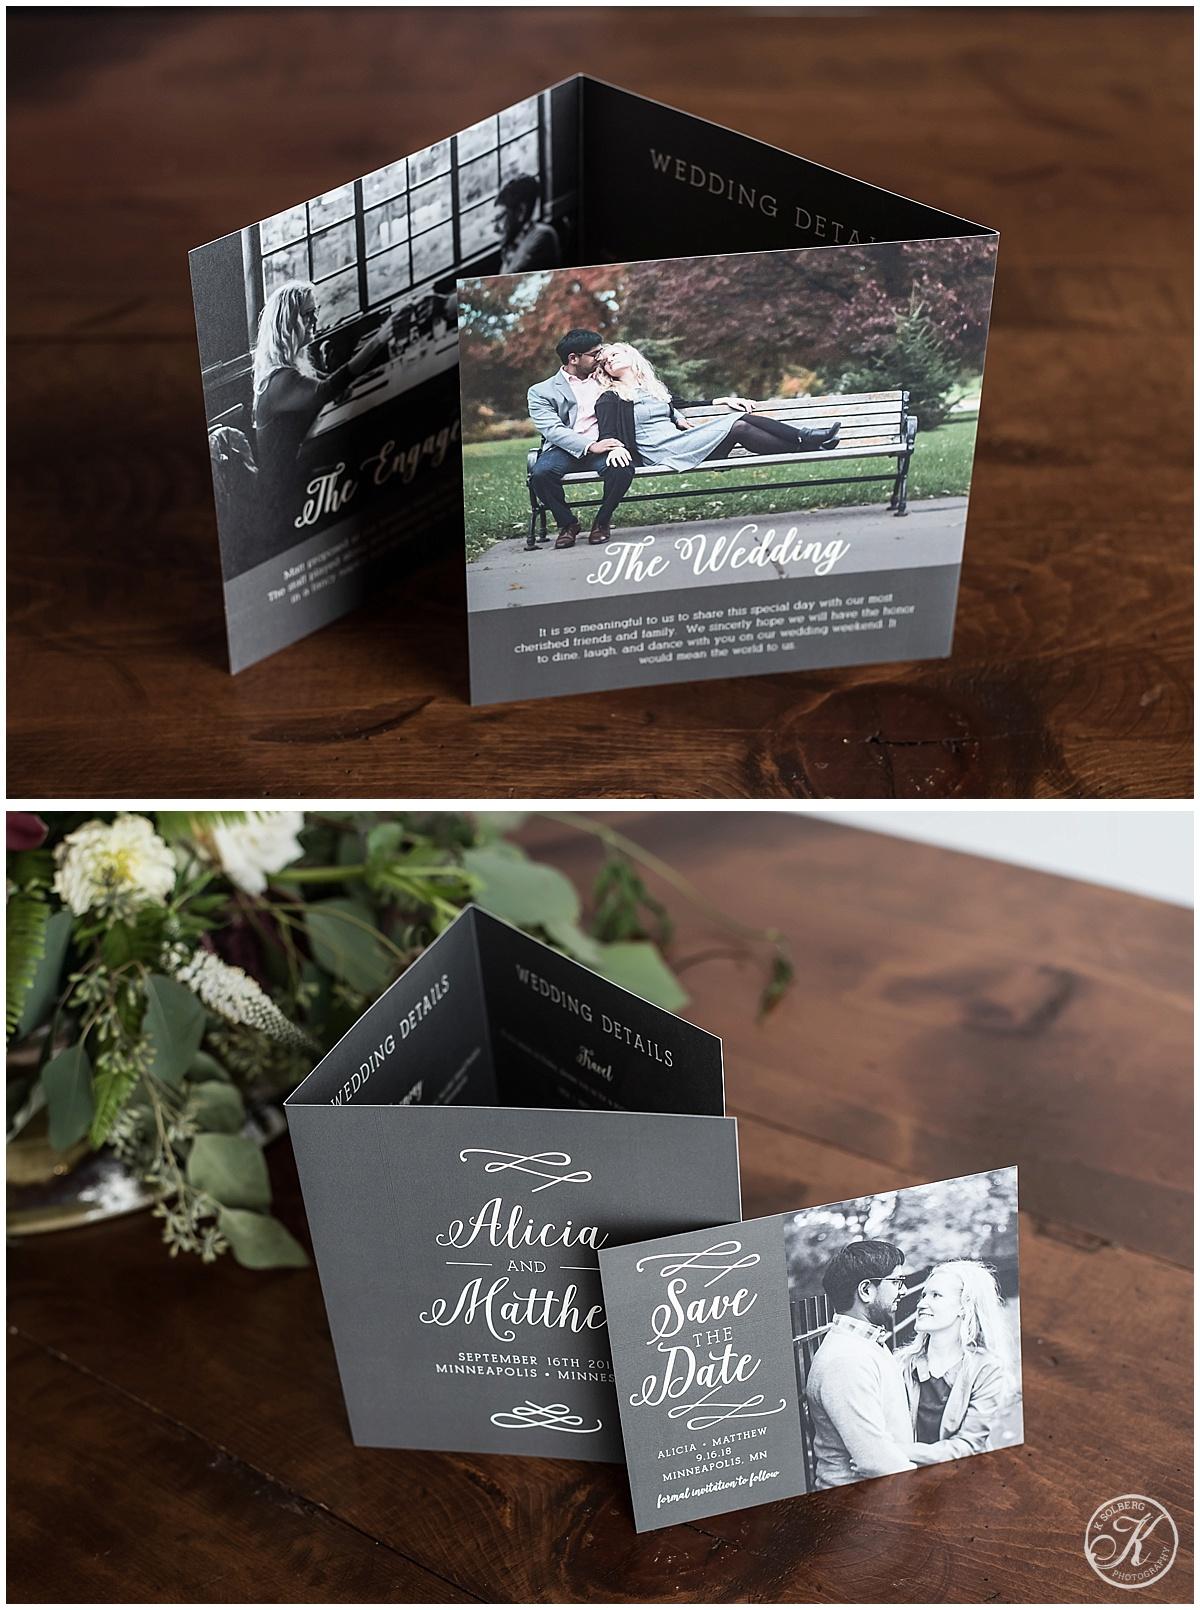 K Solberg Photography Basic Invite Samples